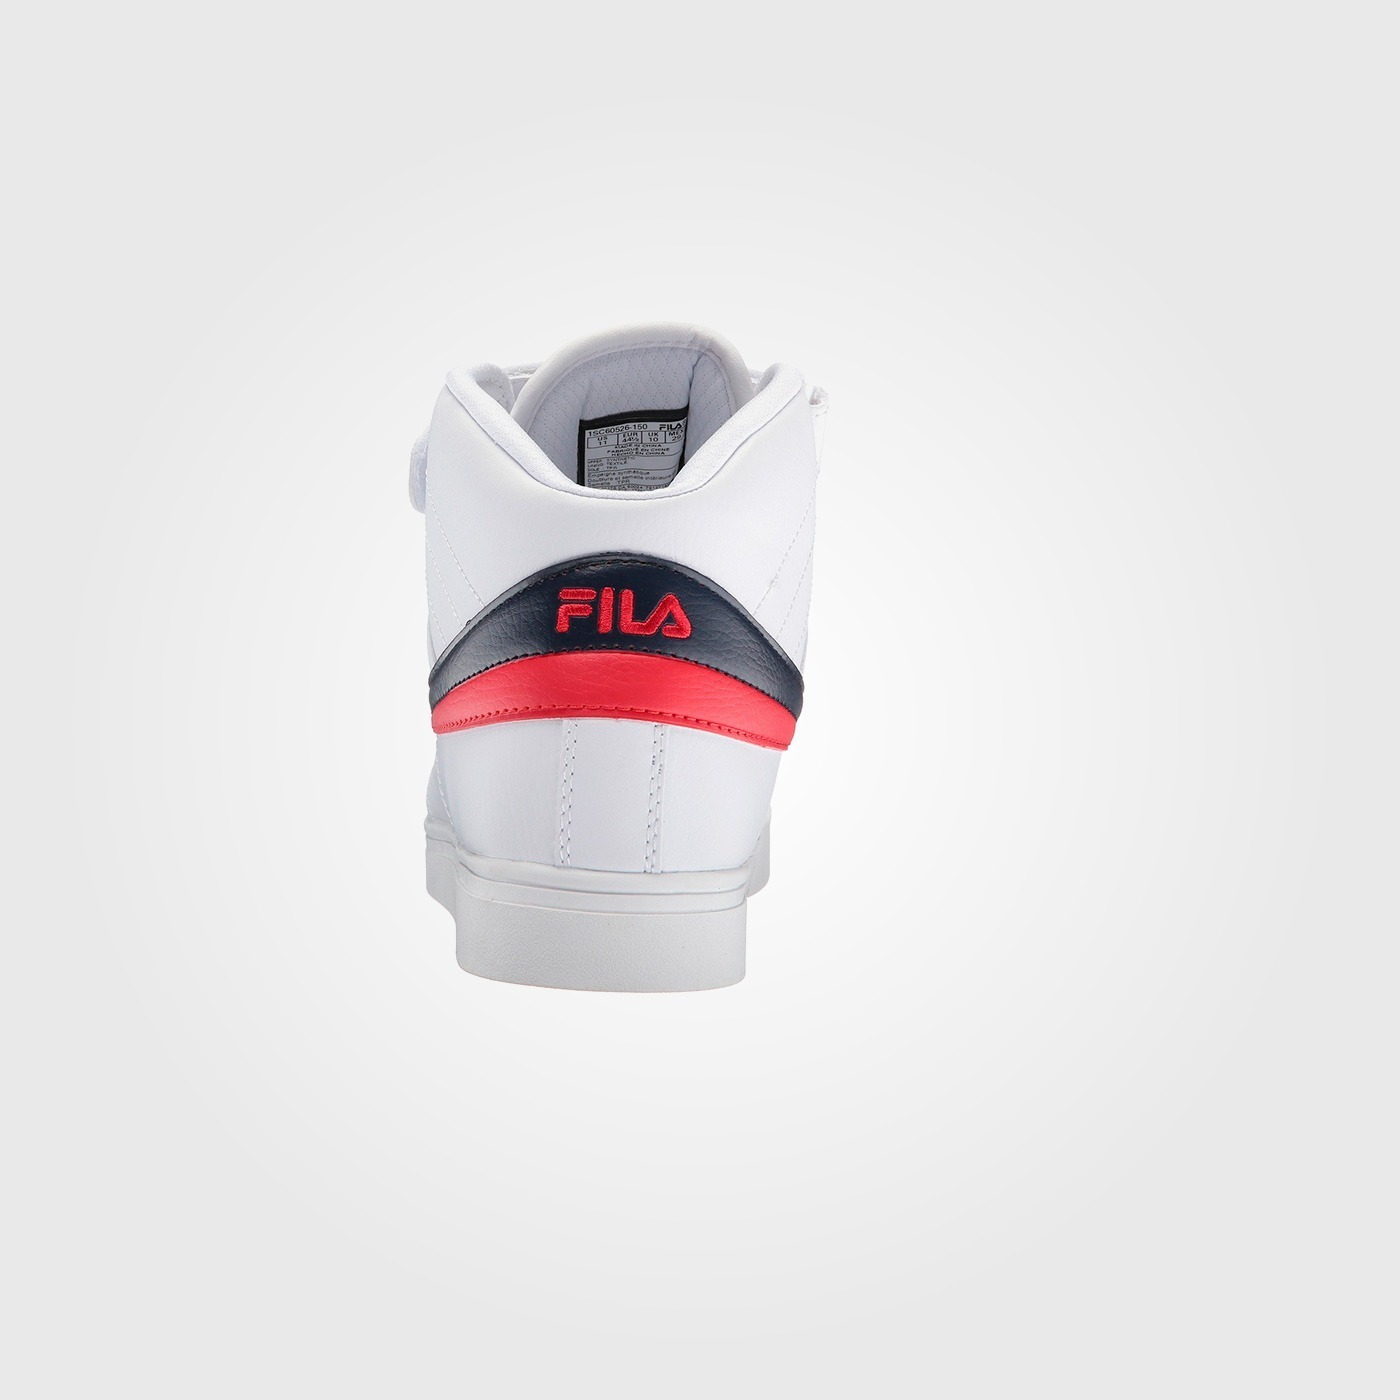 Кроссовки Fila Vulc 13 Mid Plus White/Navy/Red